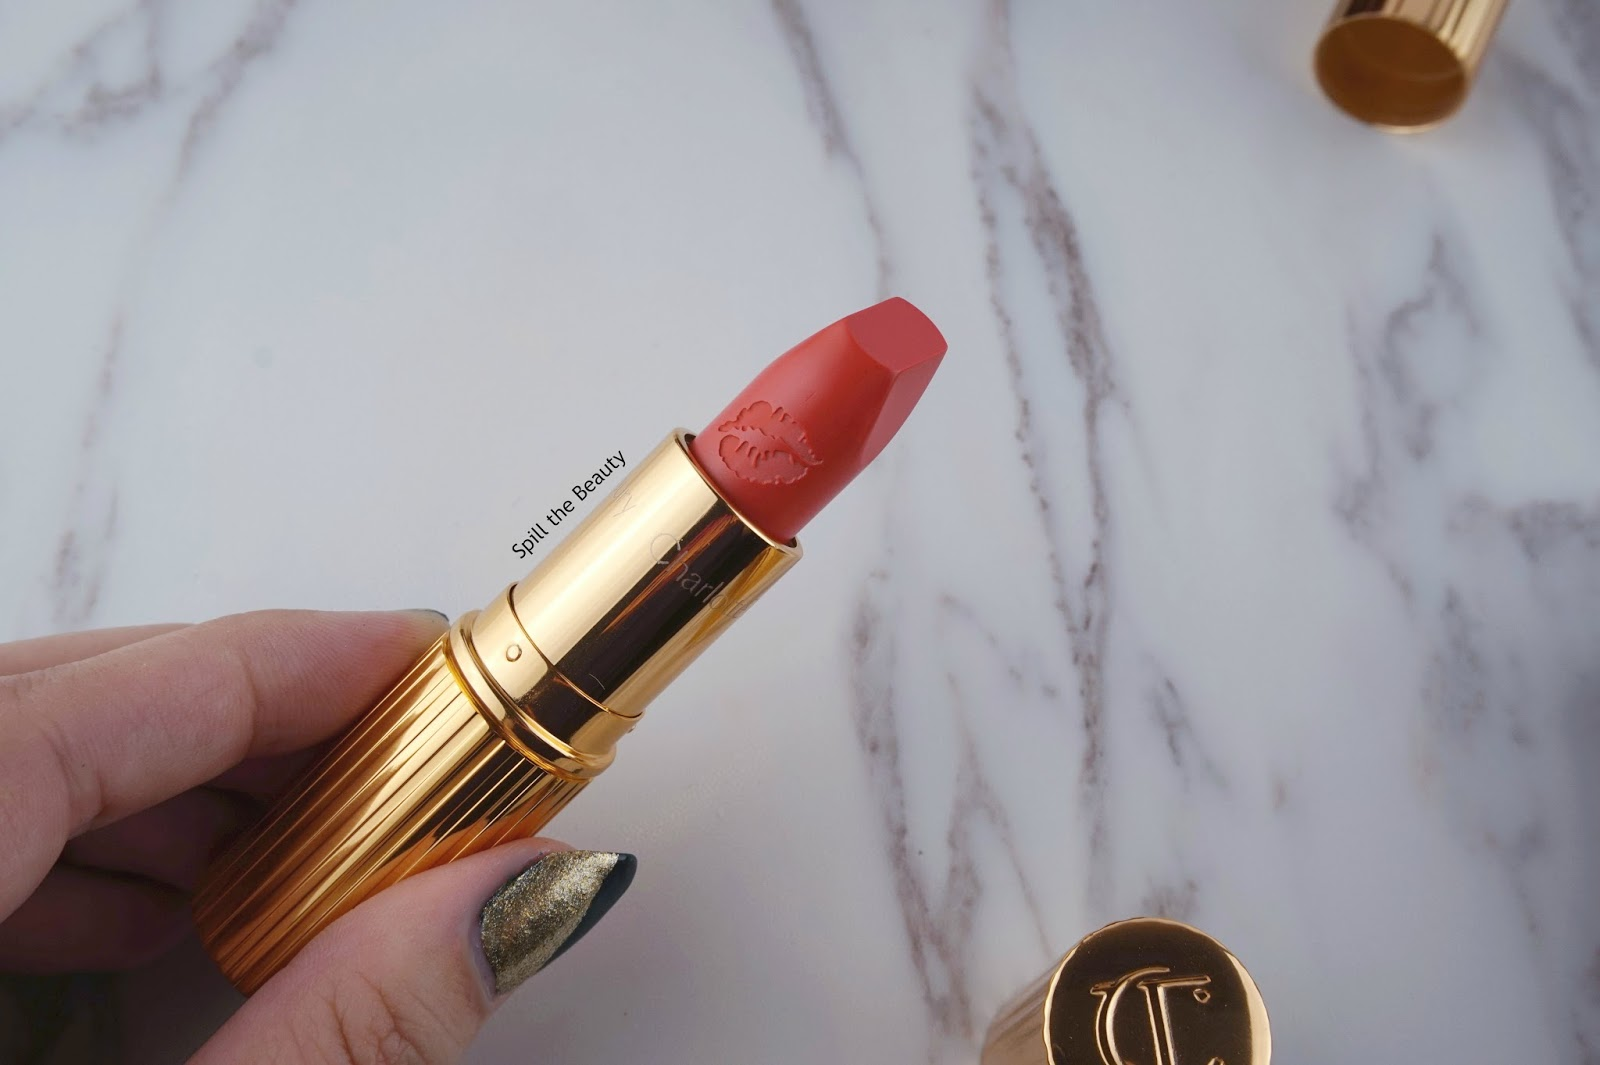 charlotte tilbury hot lips lipstick secret salma kim k.w. miranda may review swatches look miranda may 2 lip swatch